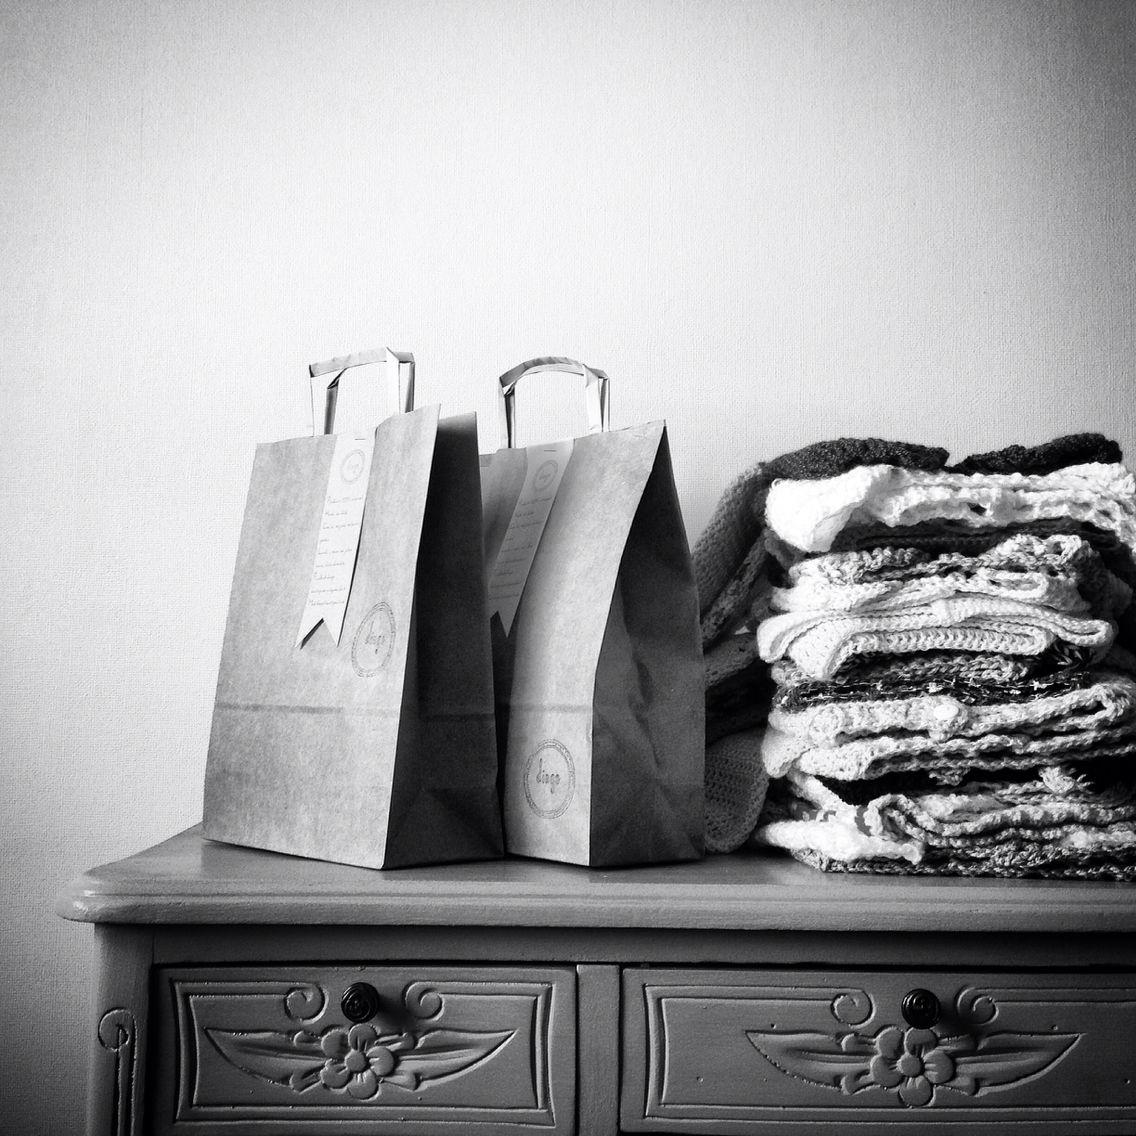 Chalequitos, chaquetas, zapatitos y gorritos para guaguas tejidos a mano | A pedido o entrega inmediata según disponibilidad | Mail: dingelanas@gmail.com | Instagram: DingeLanas | Facebook: Dinge | #dingelanas